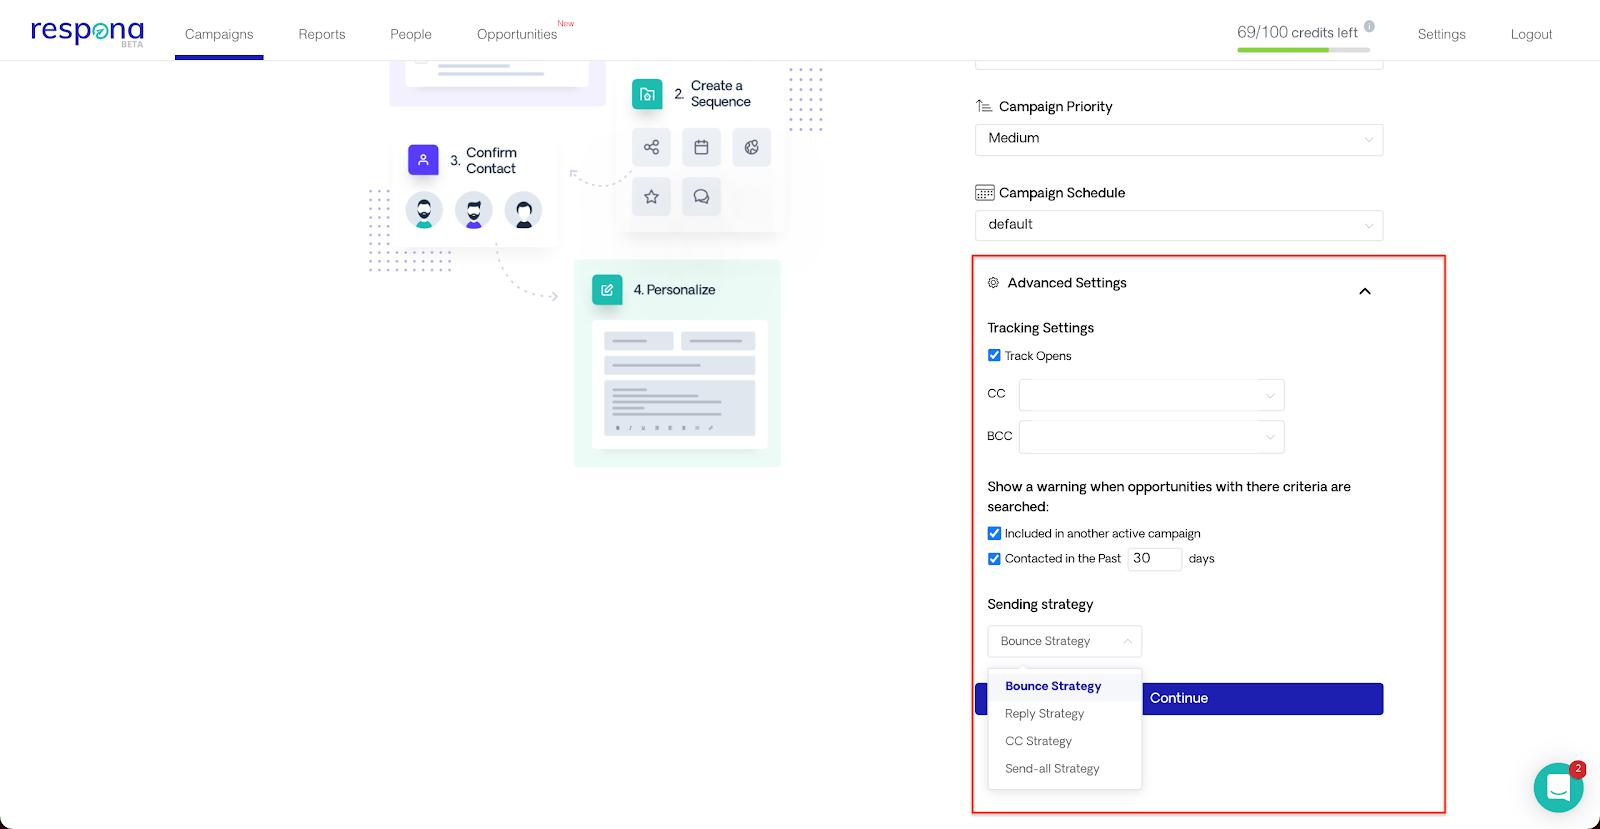 Selecting campaign advanced settings